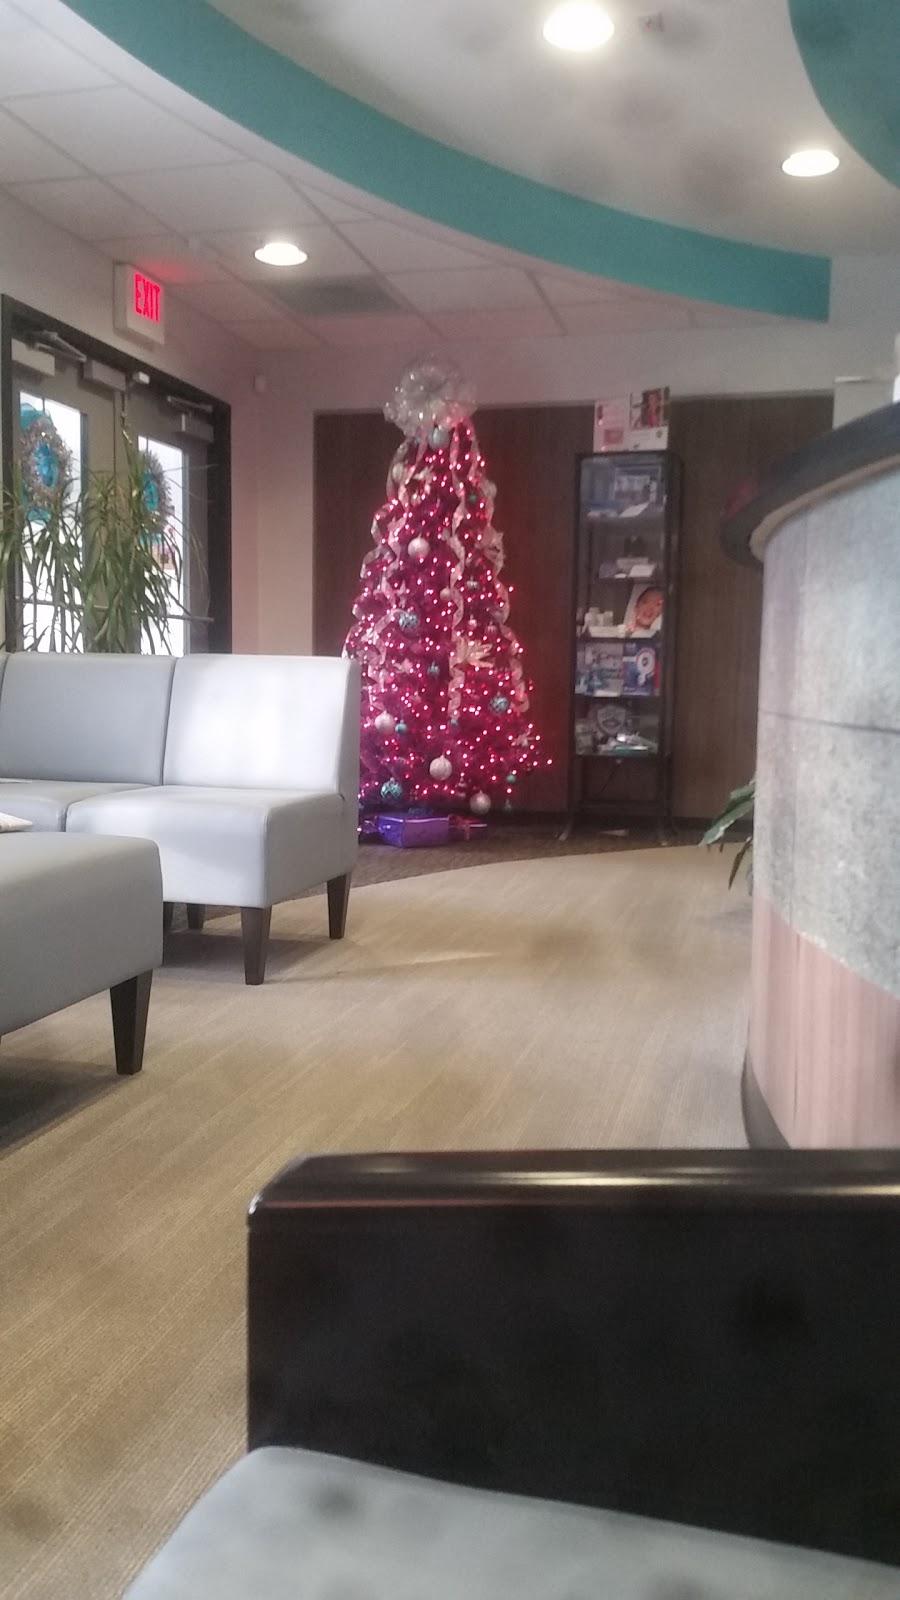 Klein Dental - dentist  | Photo 1 of 2 | Address: 2 Barlo Cir, Dillsburg, PA 17019, USA | Phone: (717) 432-9762